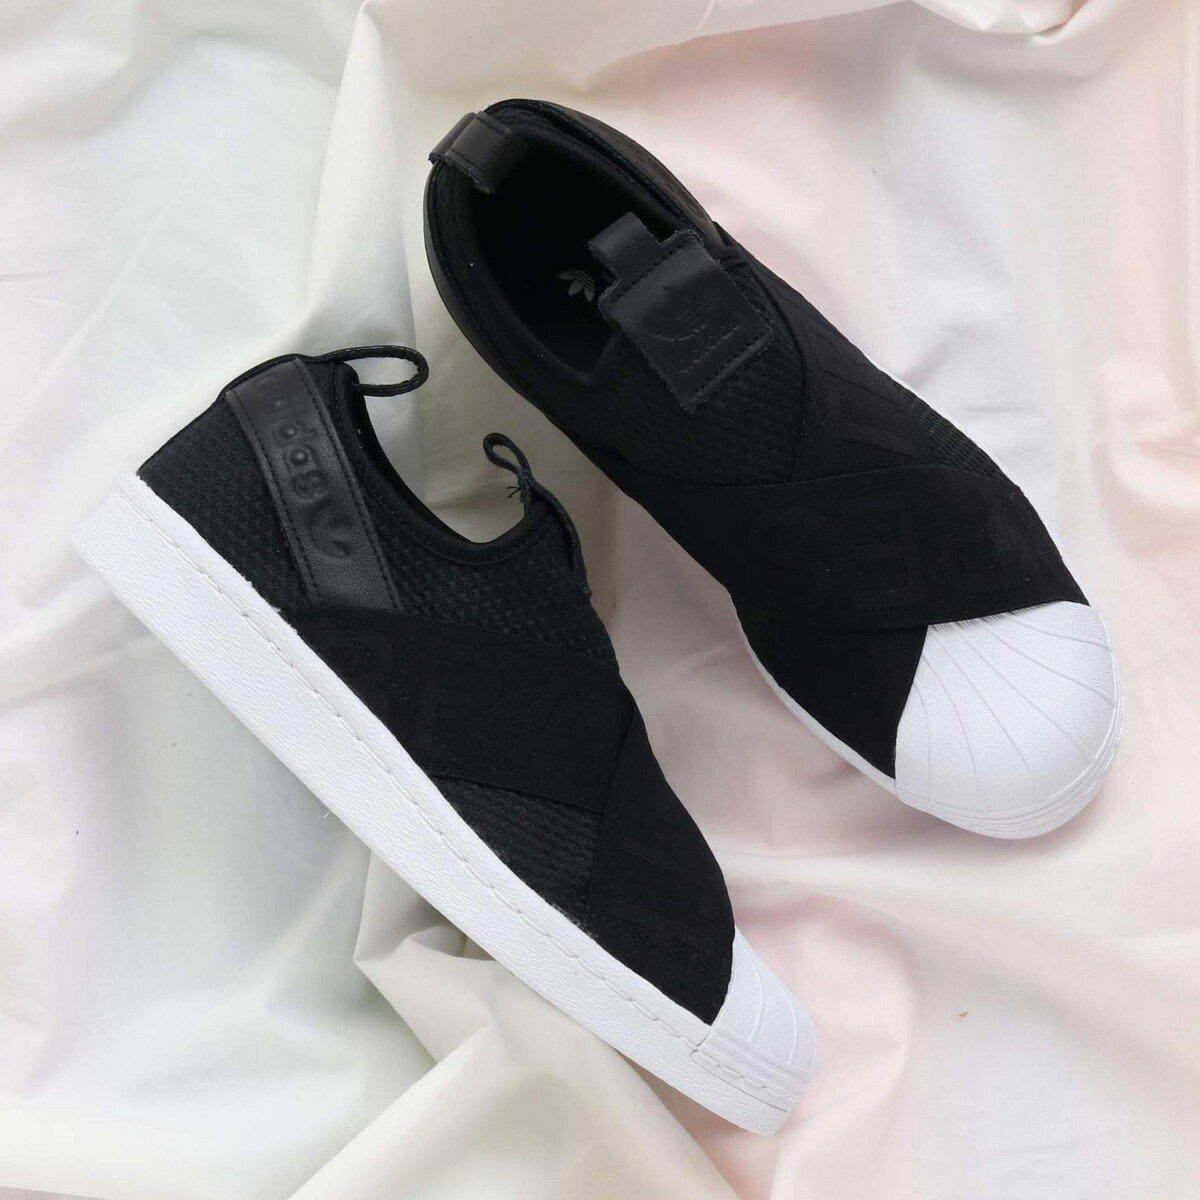 adidas Originals SUPERSTAR SLIPON W (アディダス オリジナルス スーパースタースリッポン W) Core Black/Core Black/Running White【レディース スニーカー】18SS-I